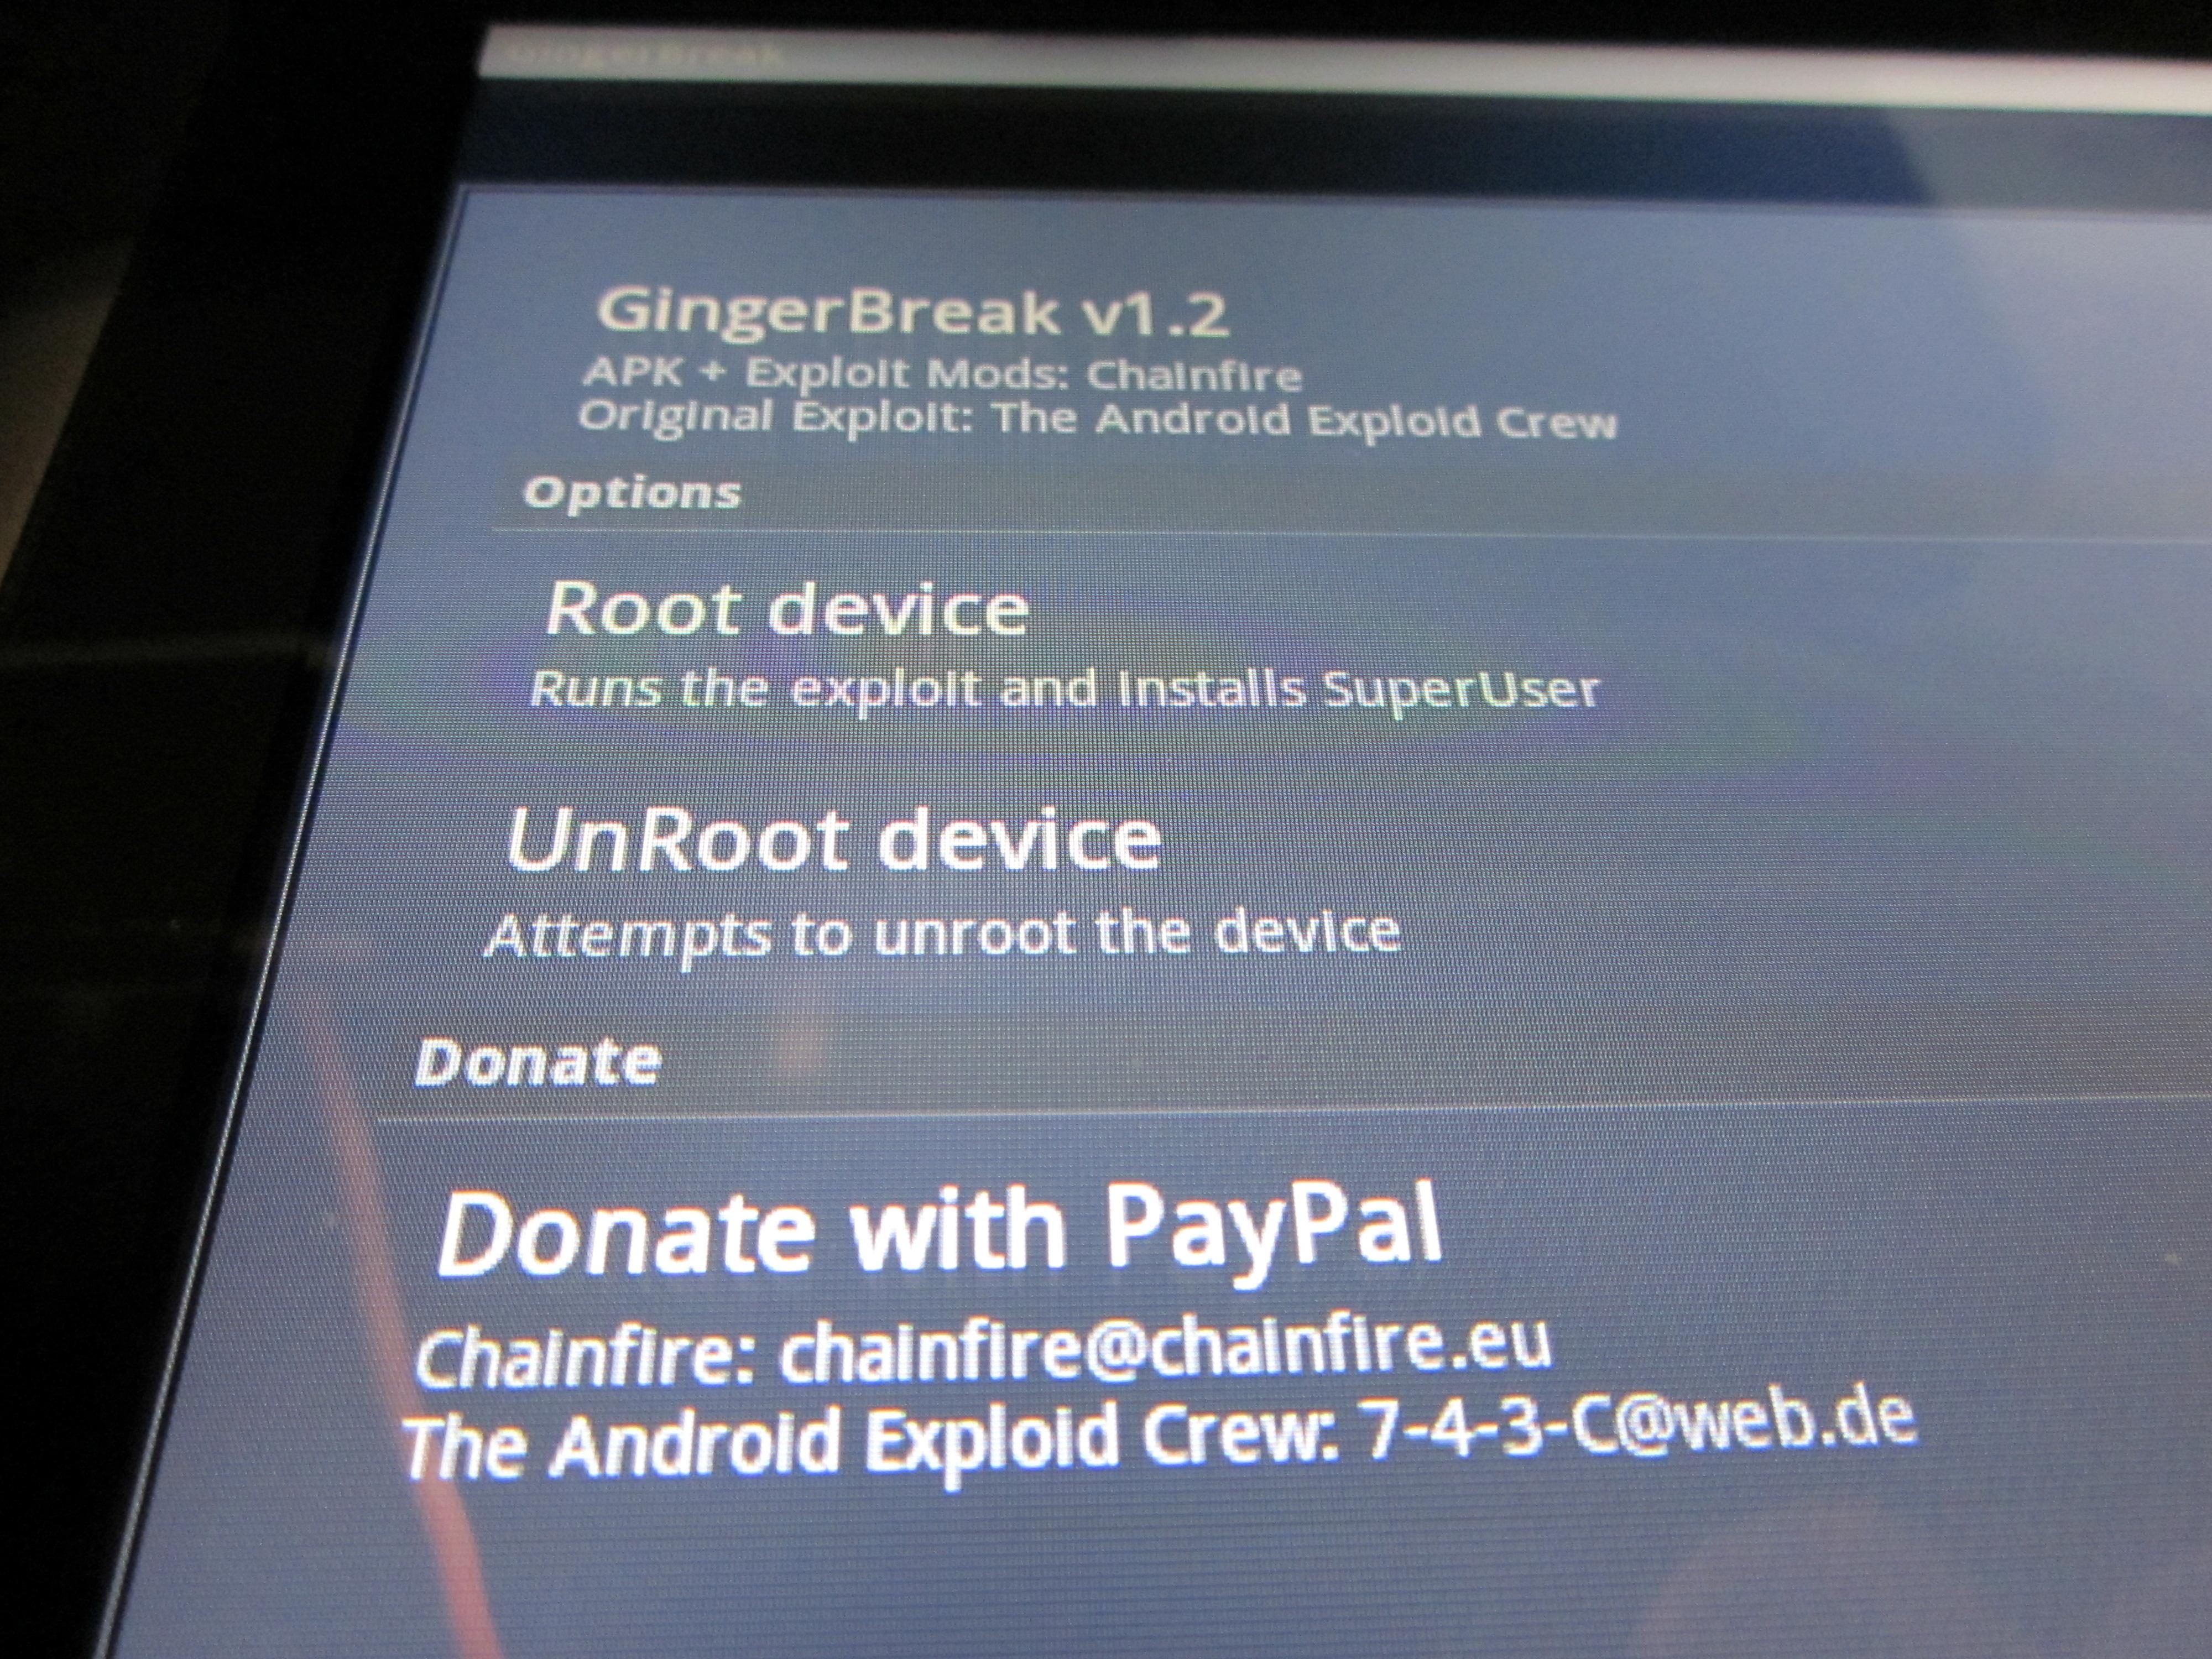 gingerbreak v1.20.apk